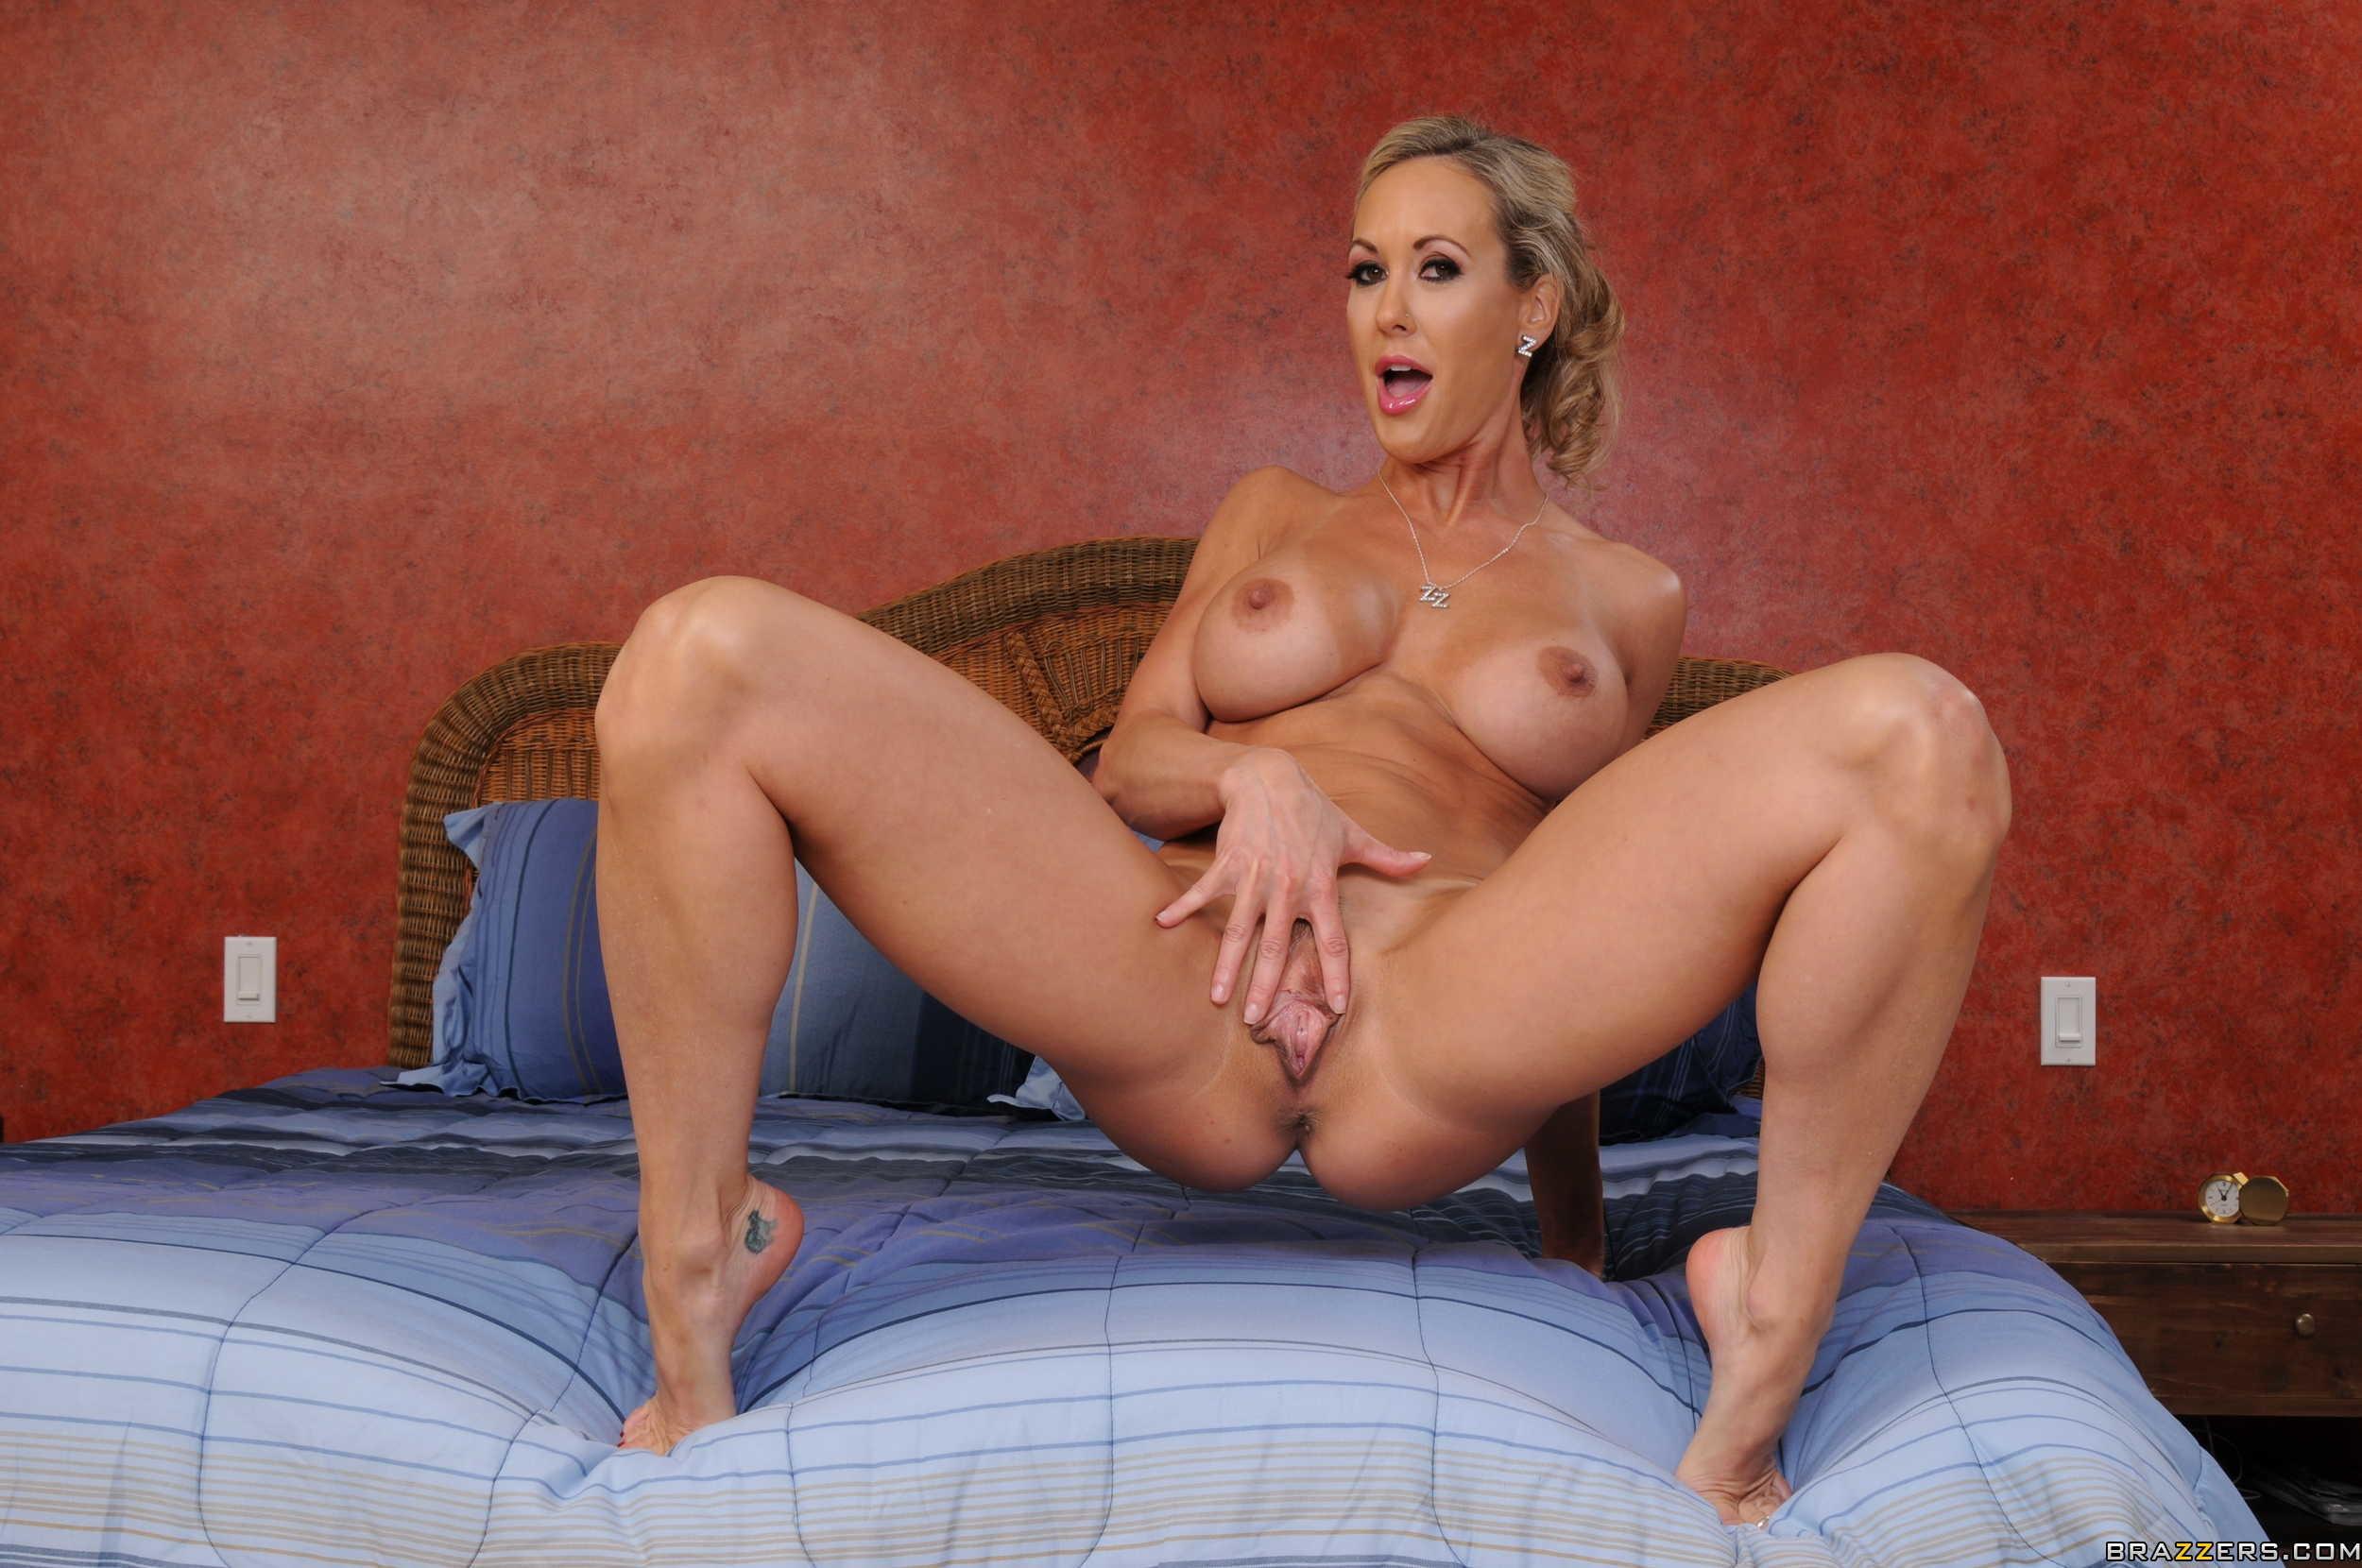 tight schoolgirl ass pics and hot sexy asses porn